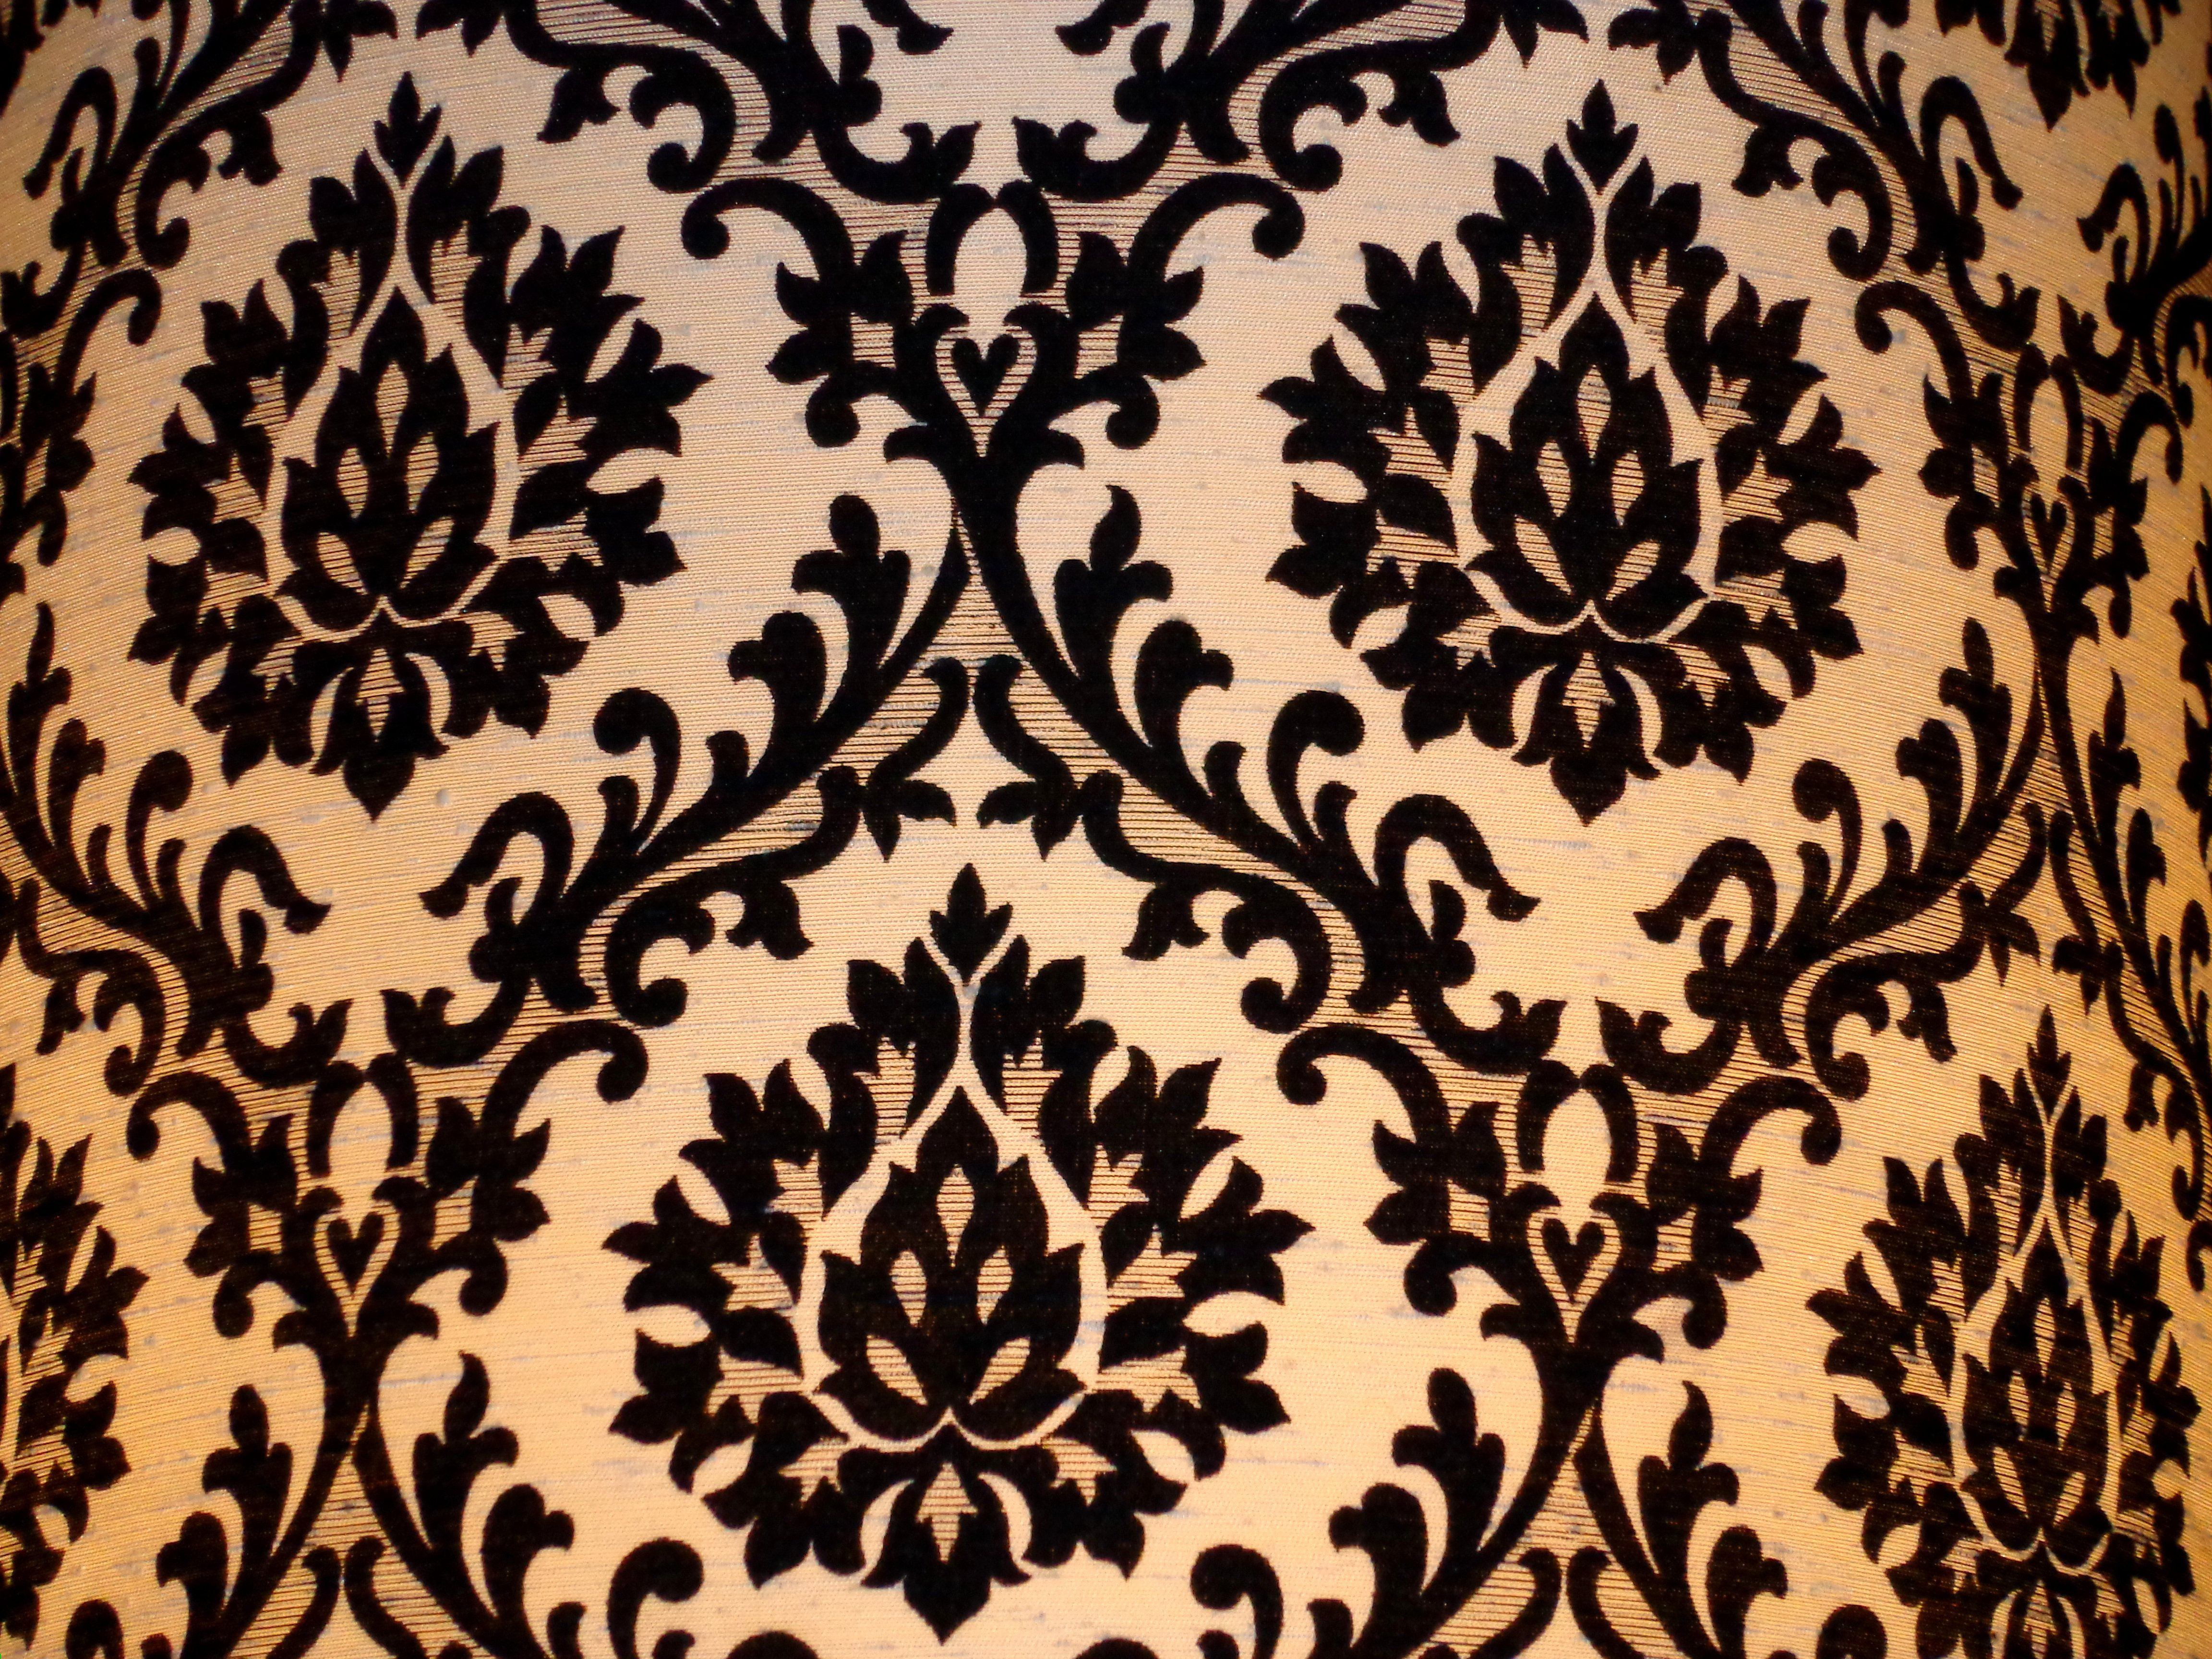 Zbalpha Alex Dai Stonestone Texture